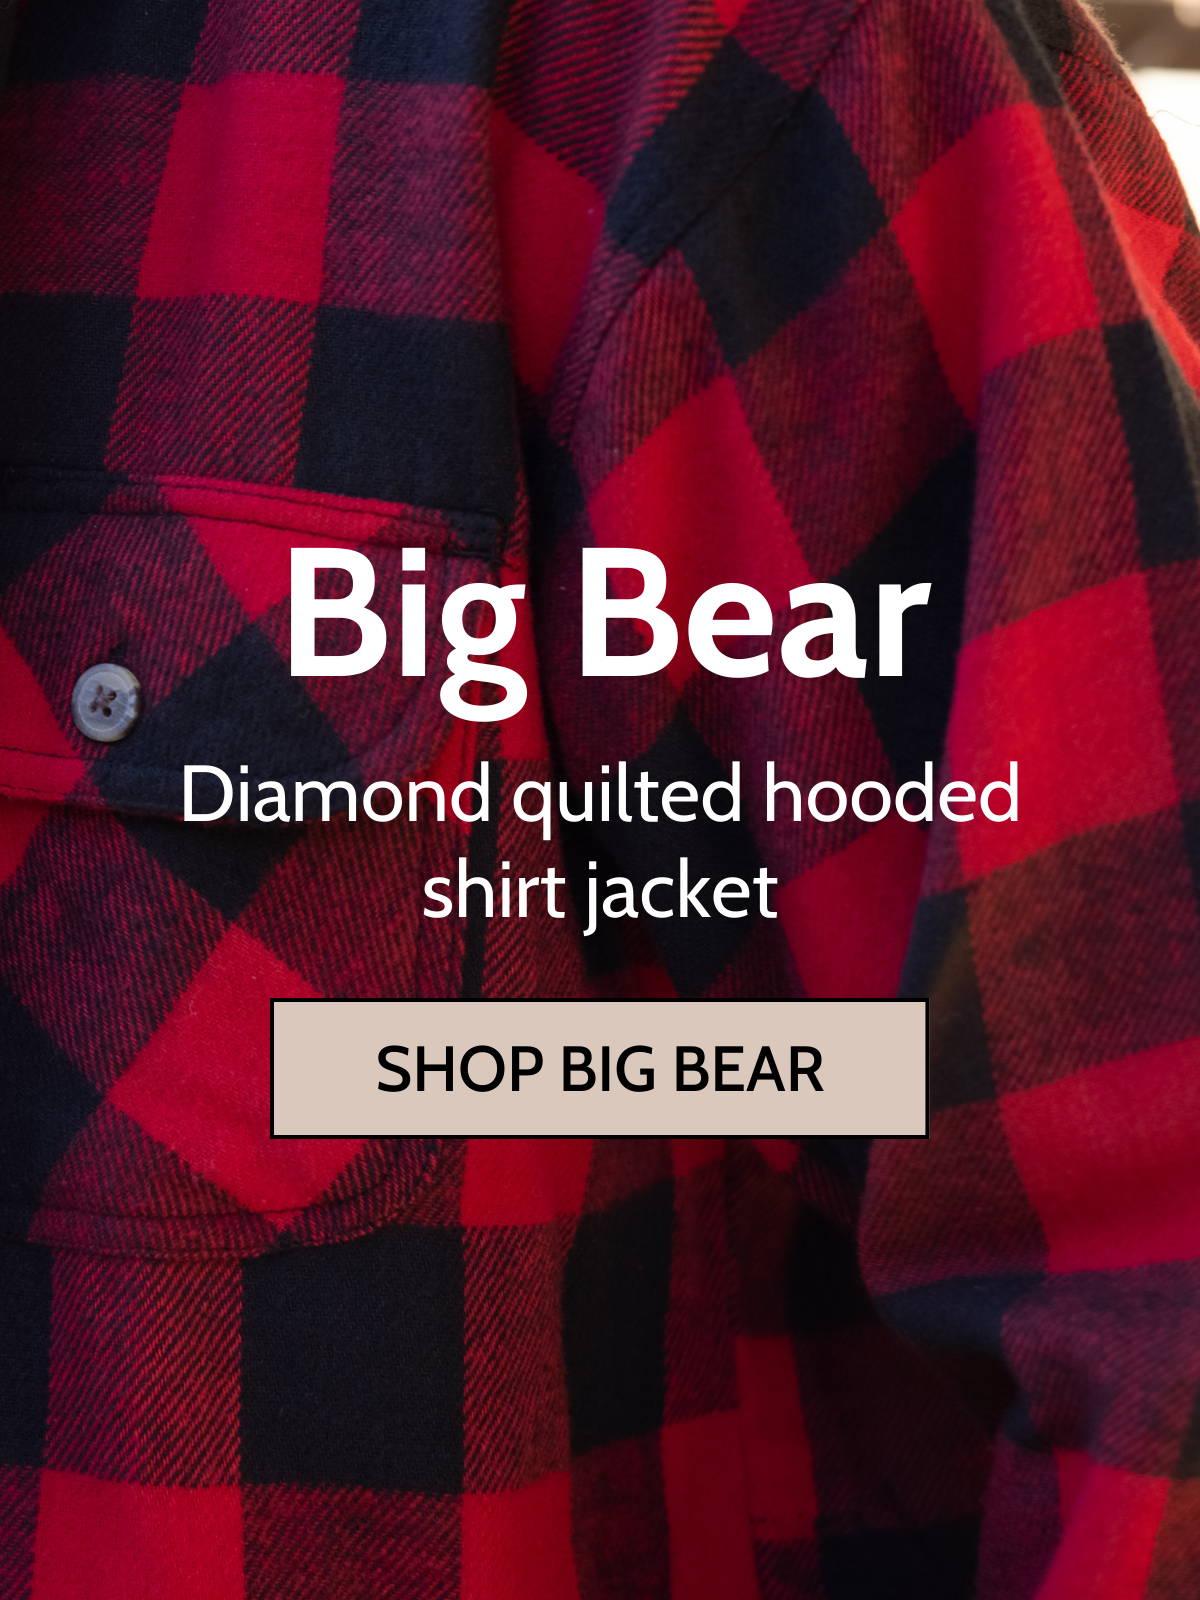 Cayon guide big bear shirt jackets